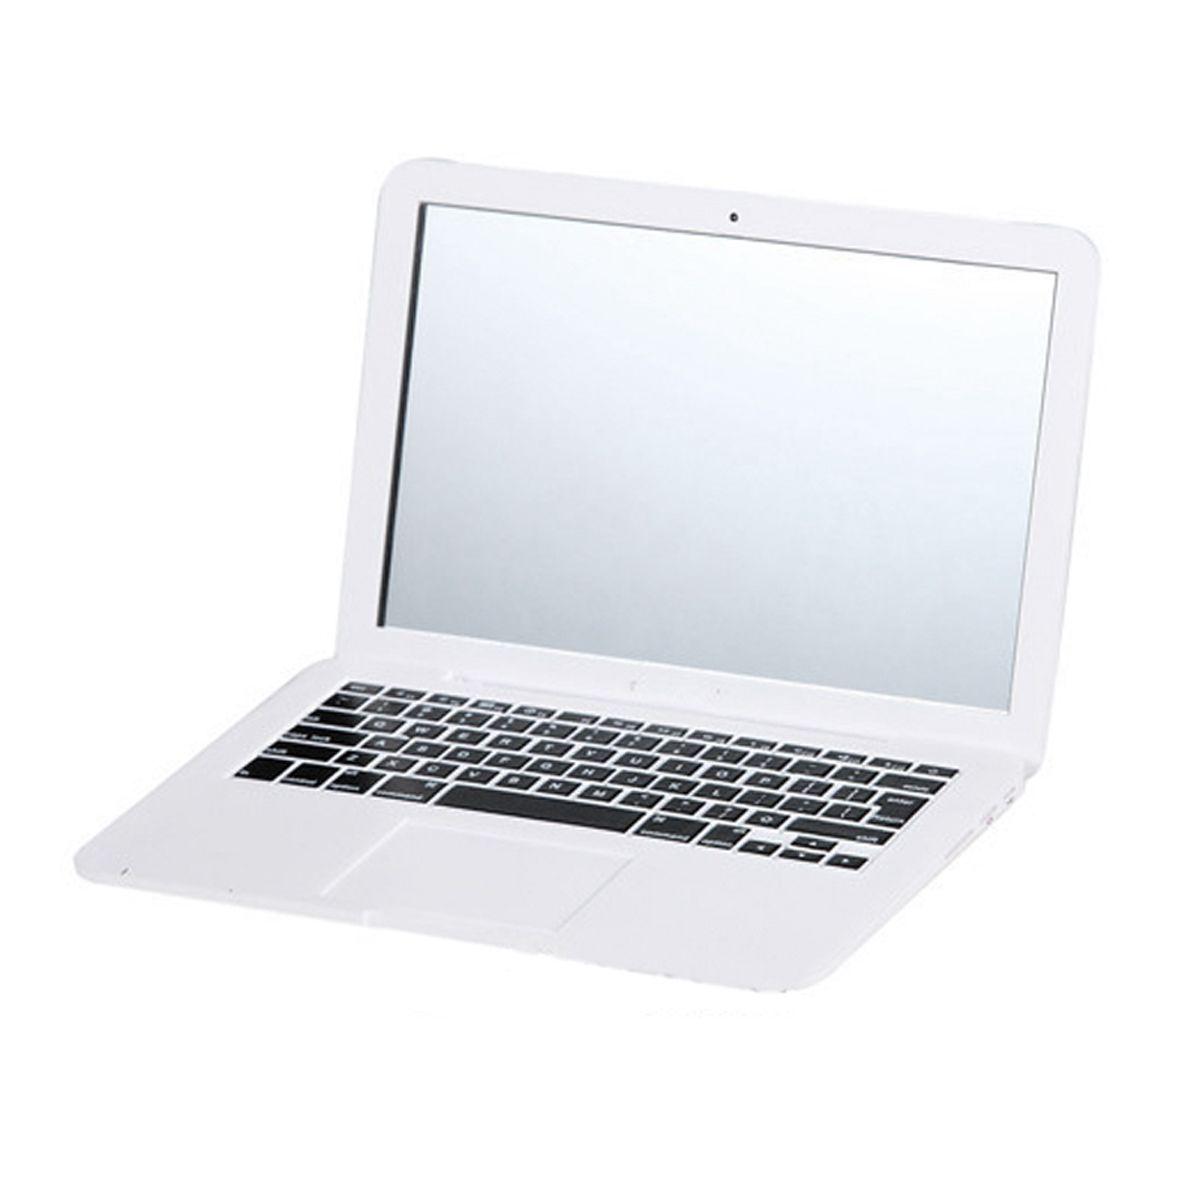 MirrorBook Air White Mini Novel Maquillage MirrorBook Air Mirror Pour Apple MacBook En Forme de 88